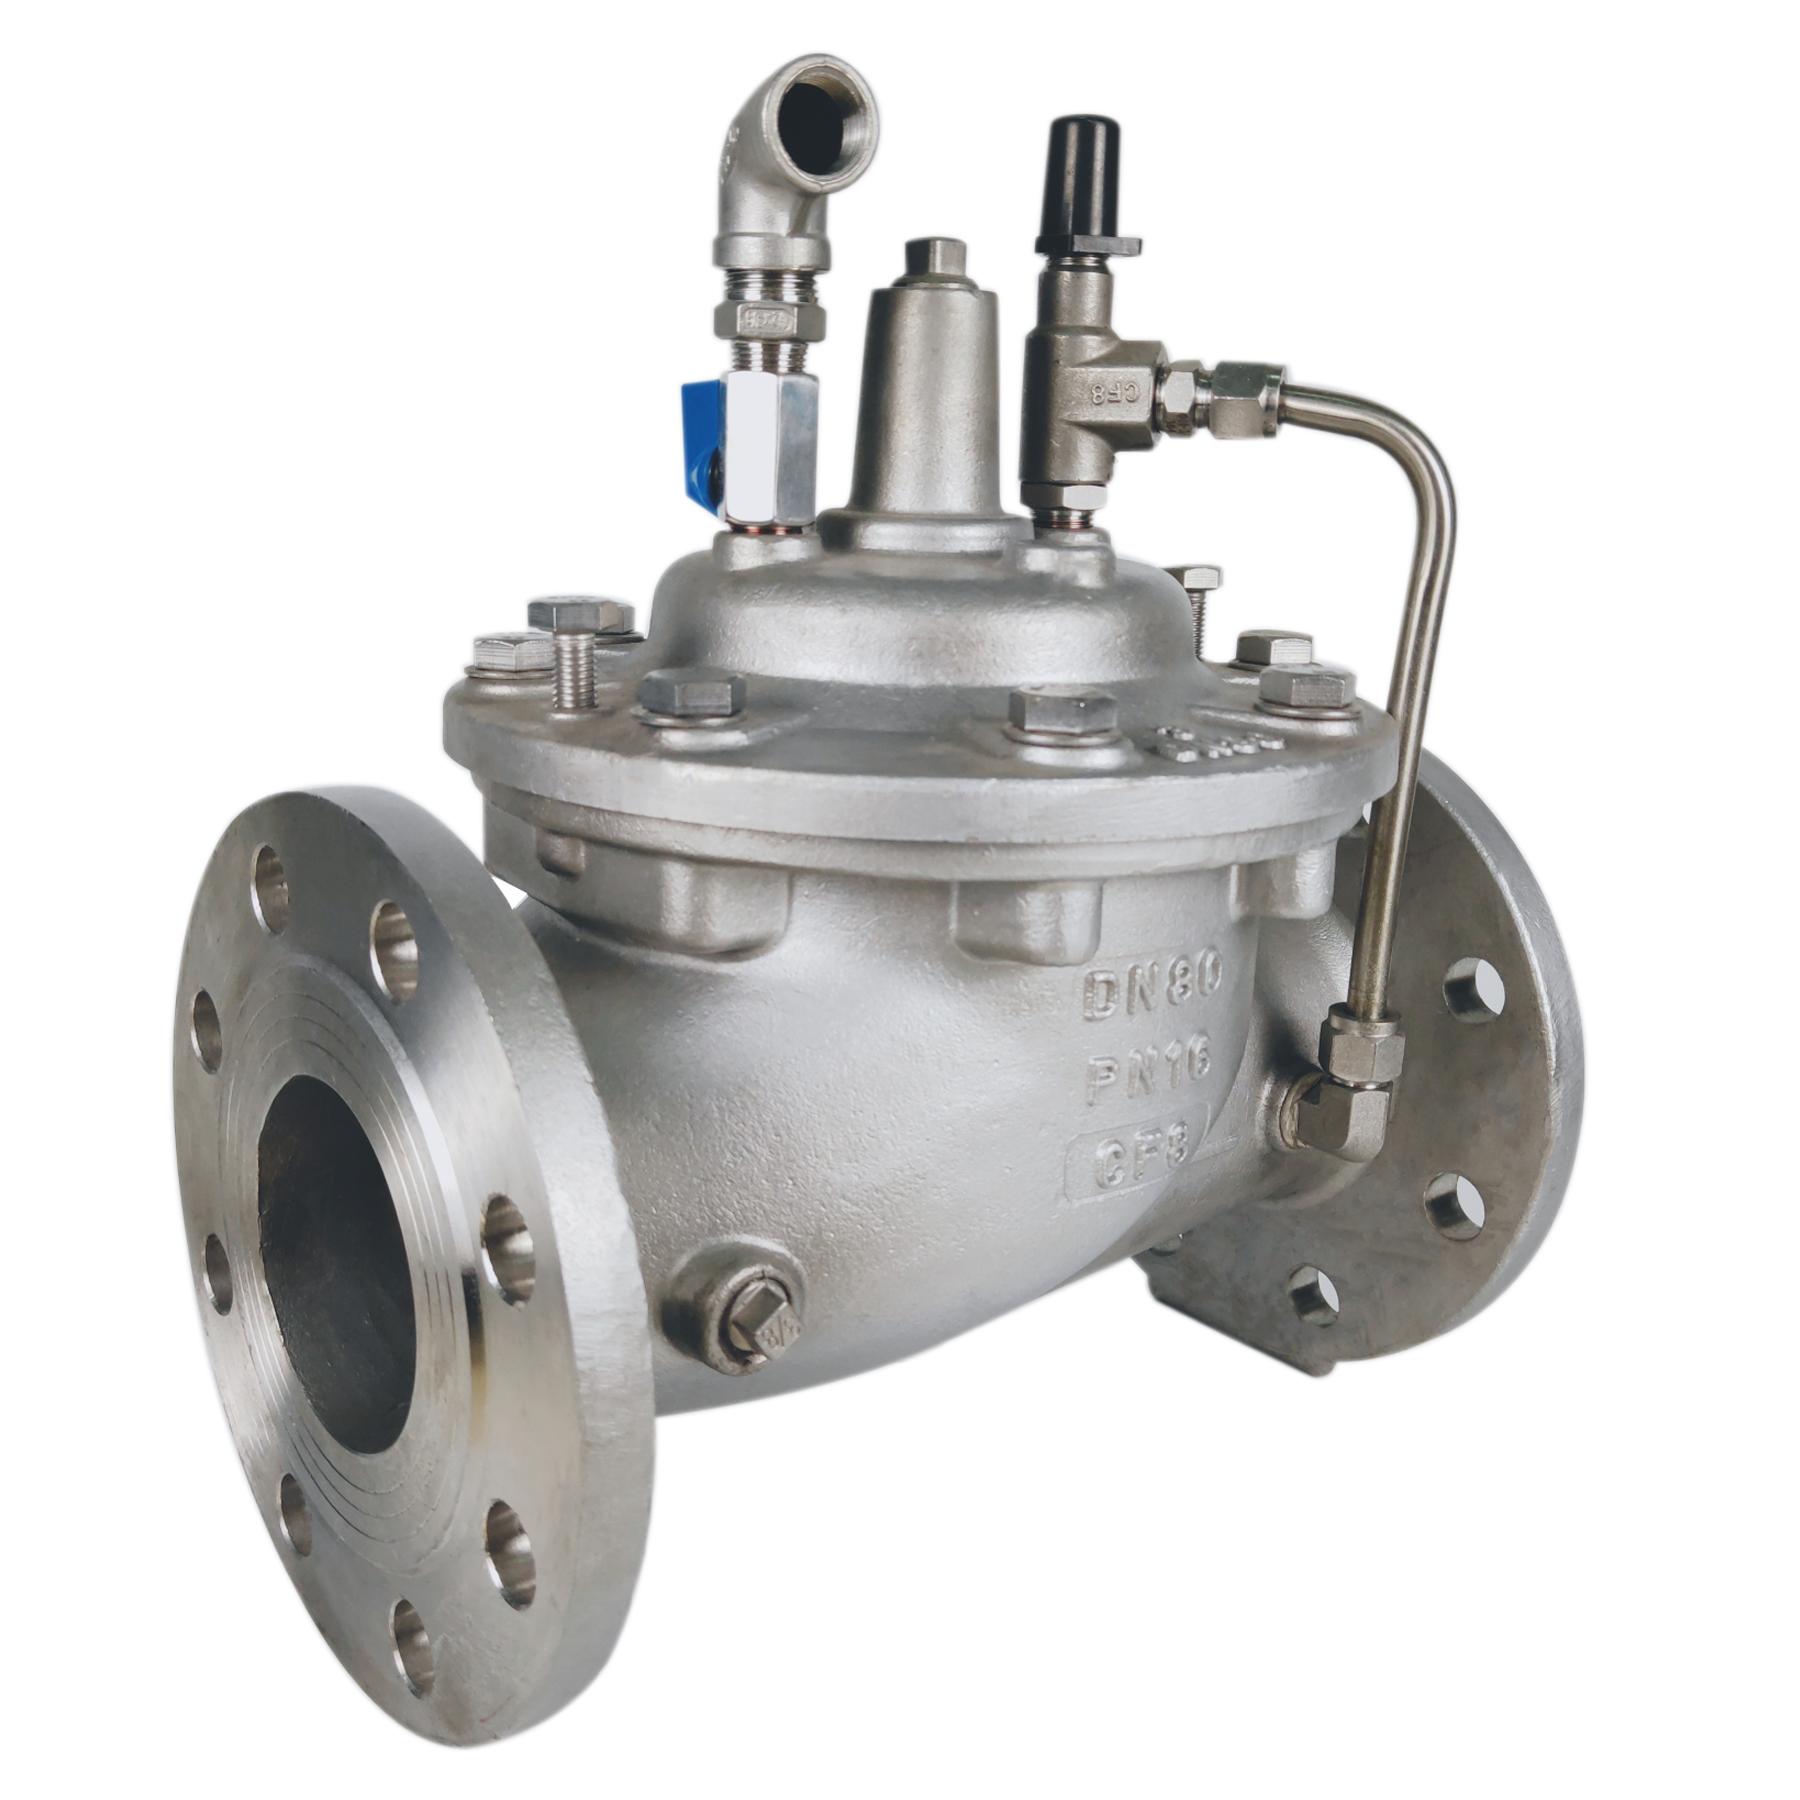 diaphragm constant control valve bonnet seat,disc neumatic control valve with positioner,globe control pressure relief valve